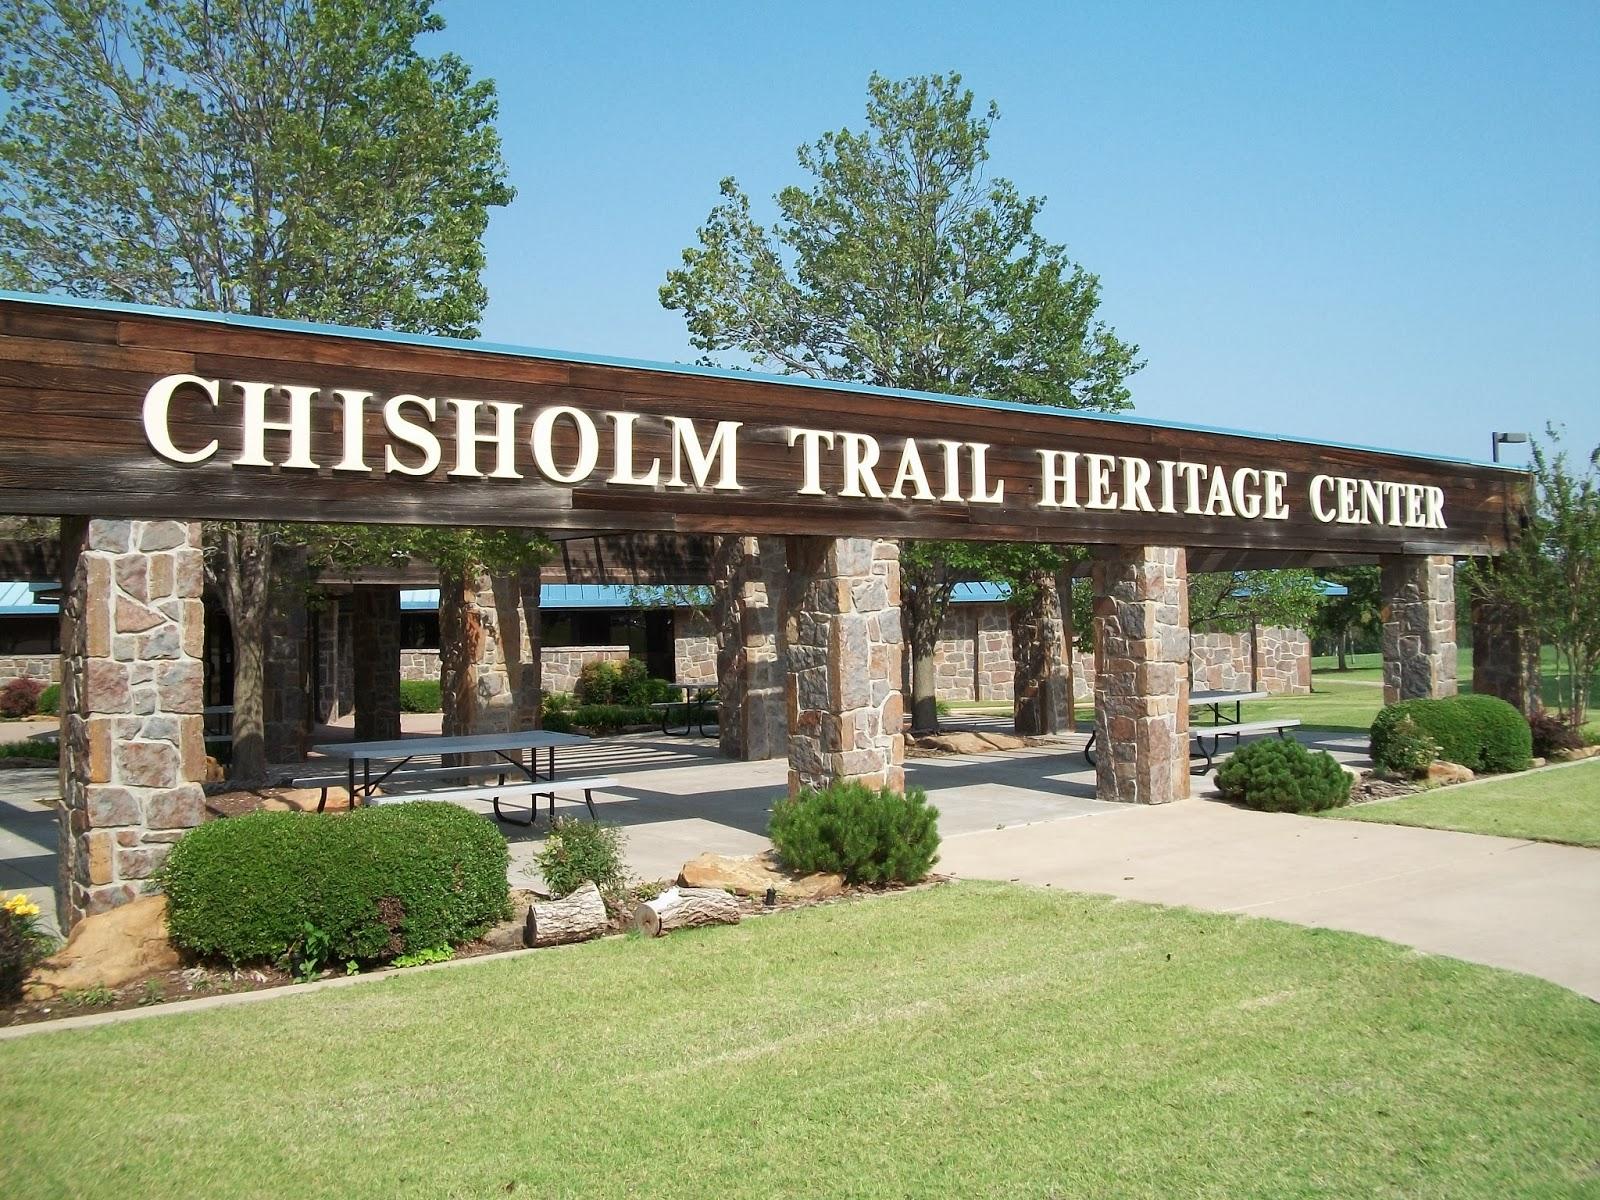 Chisholm trail casino in duncan oklahoma